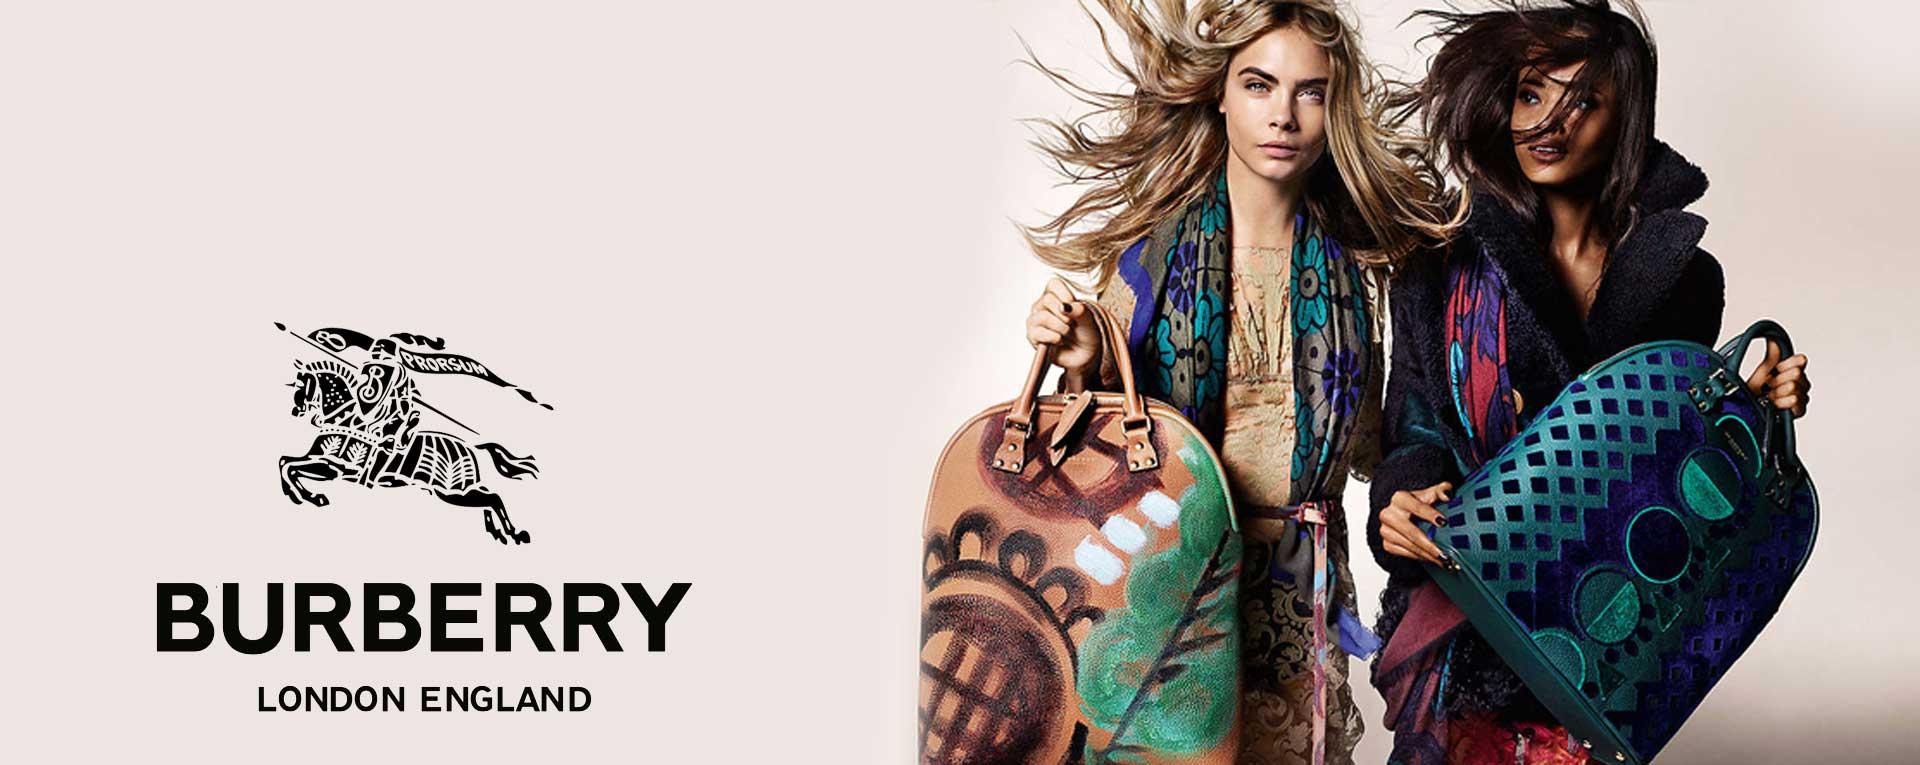 burberry r7 - برند بربری